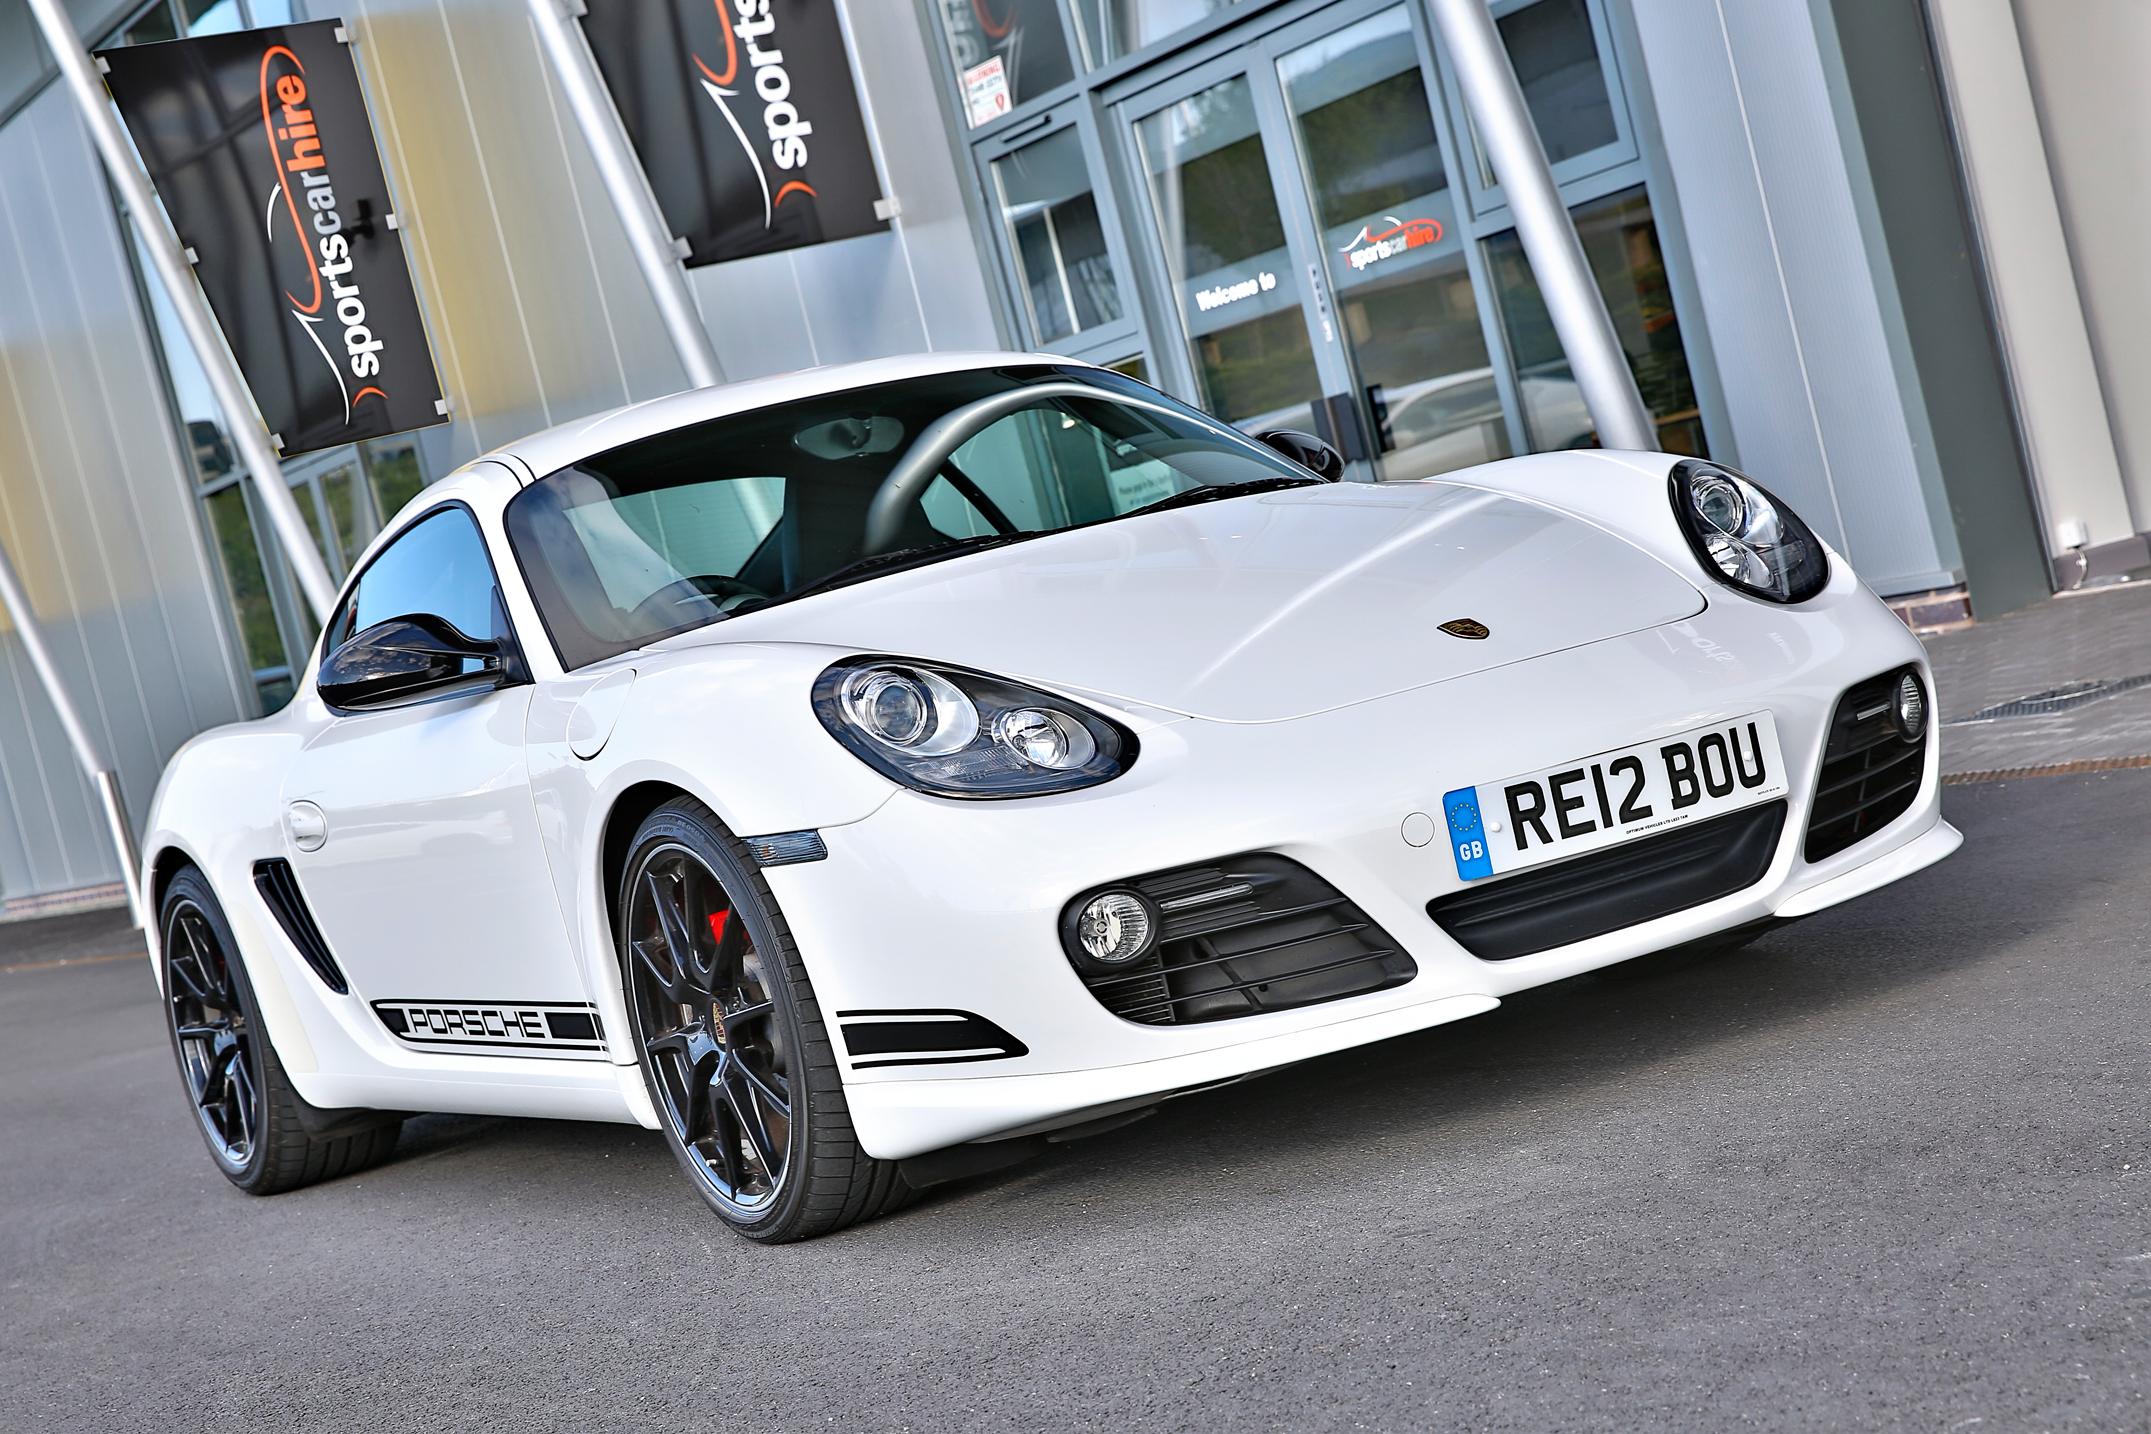 Porsche Cayman R hire from Sportshire, Shrewsbury & Telford